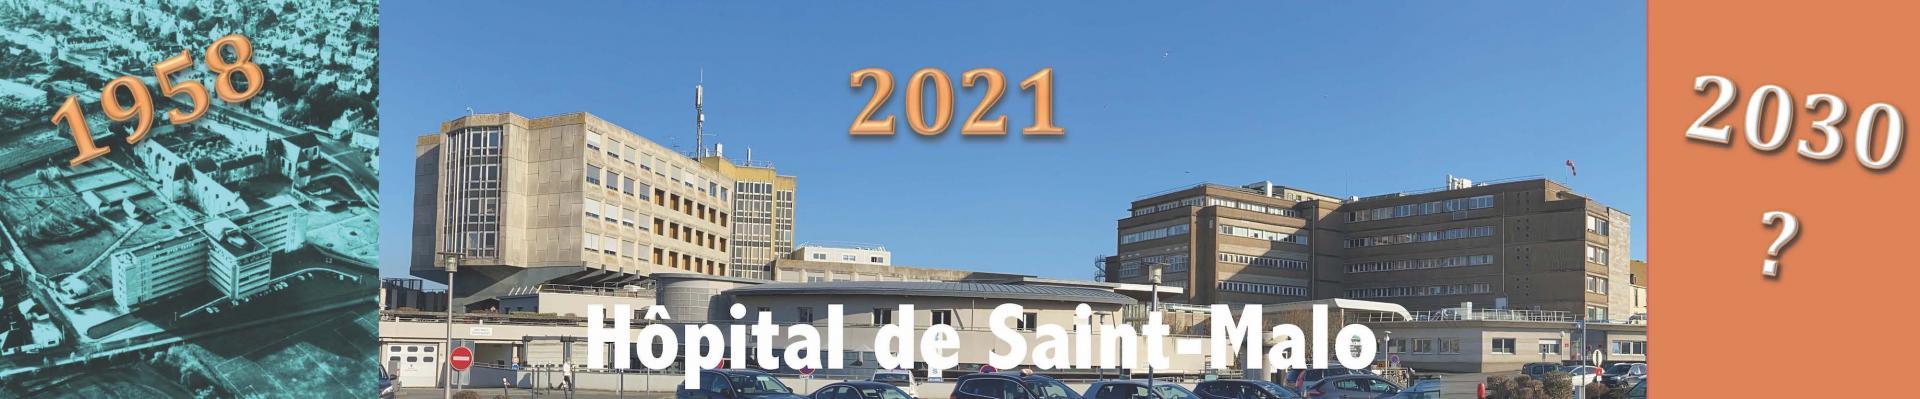 2030 ?